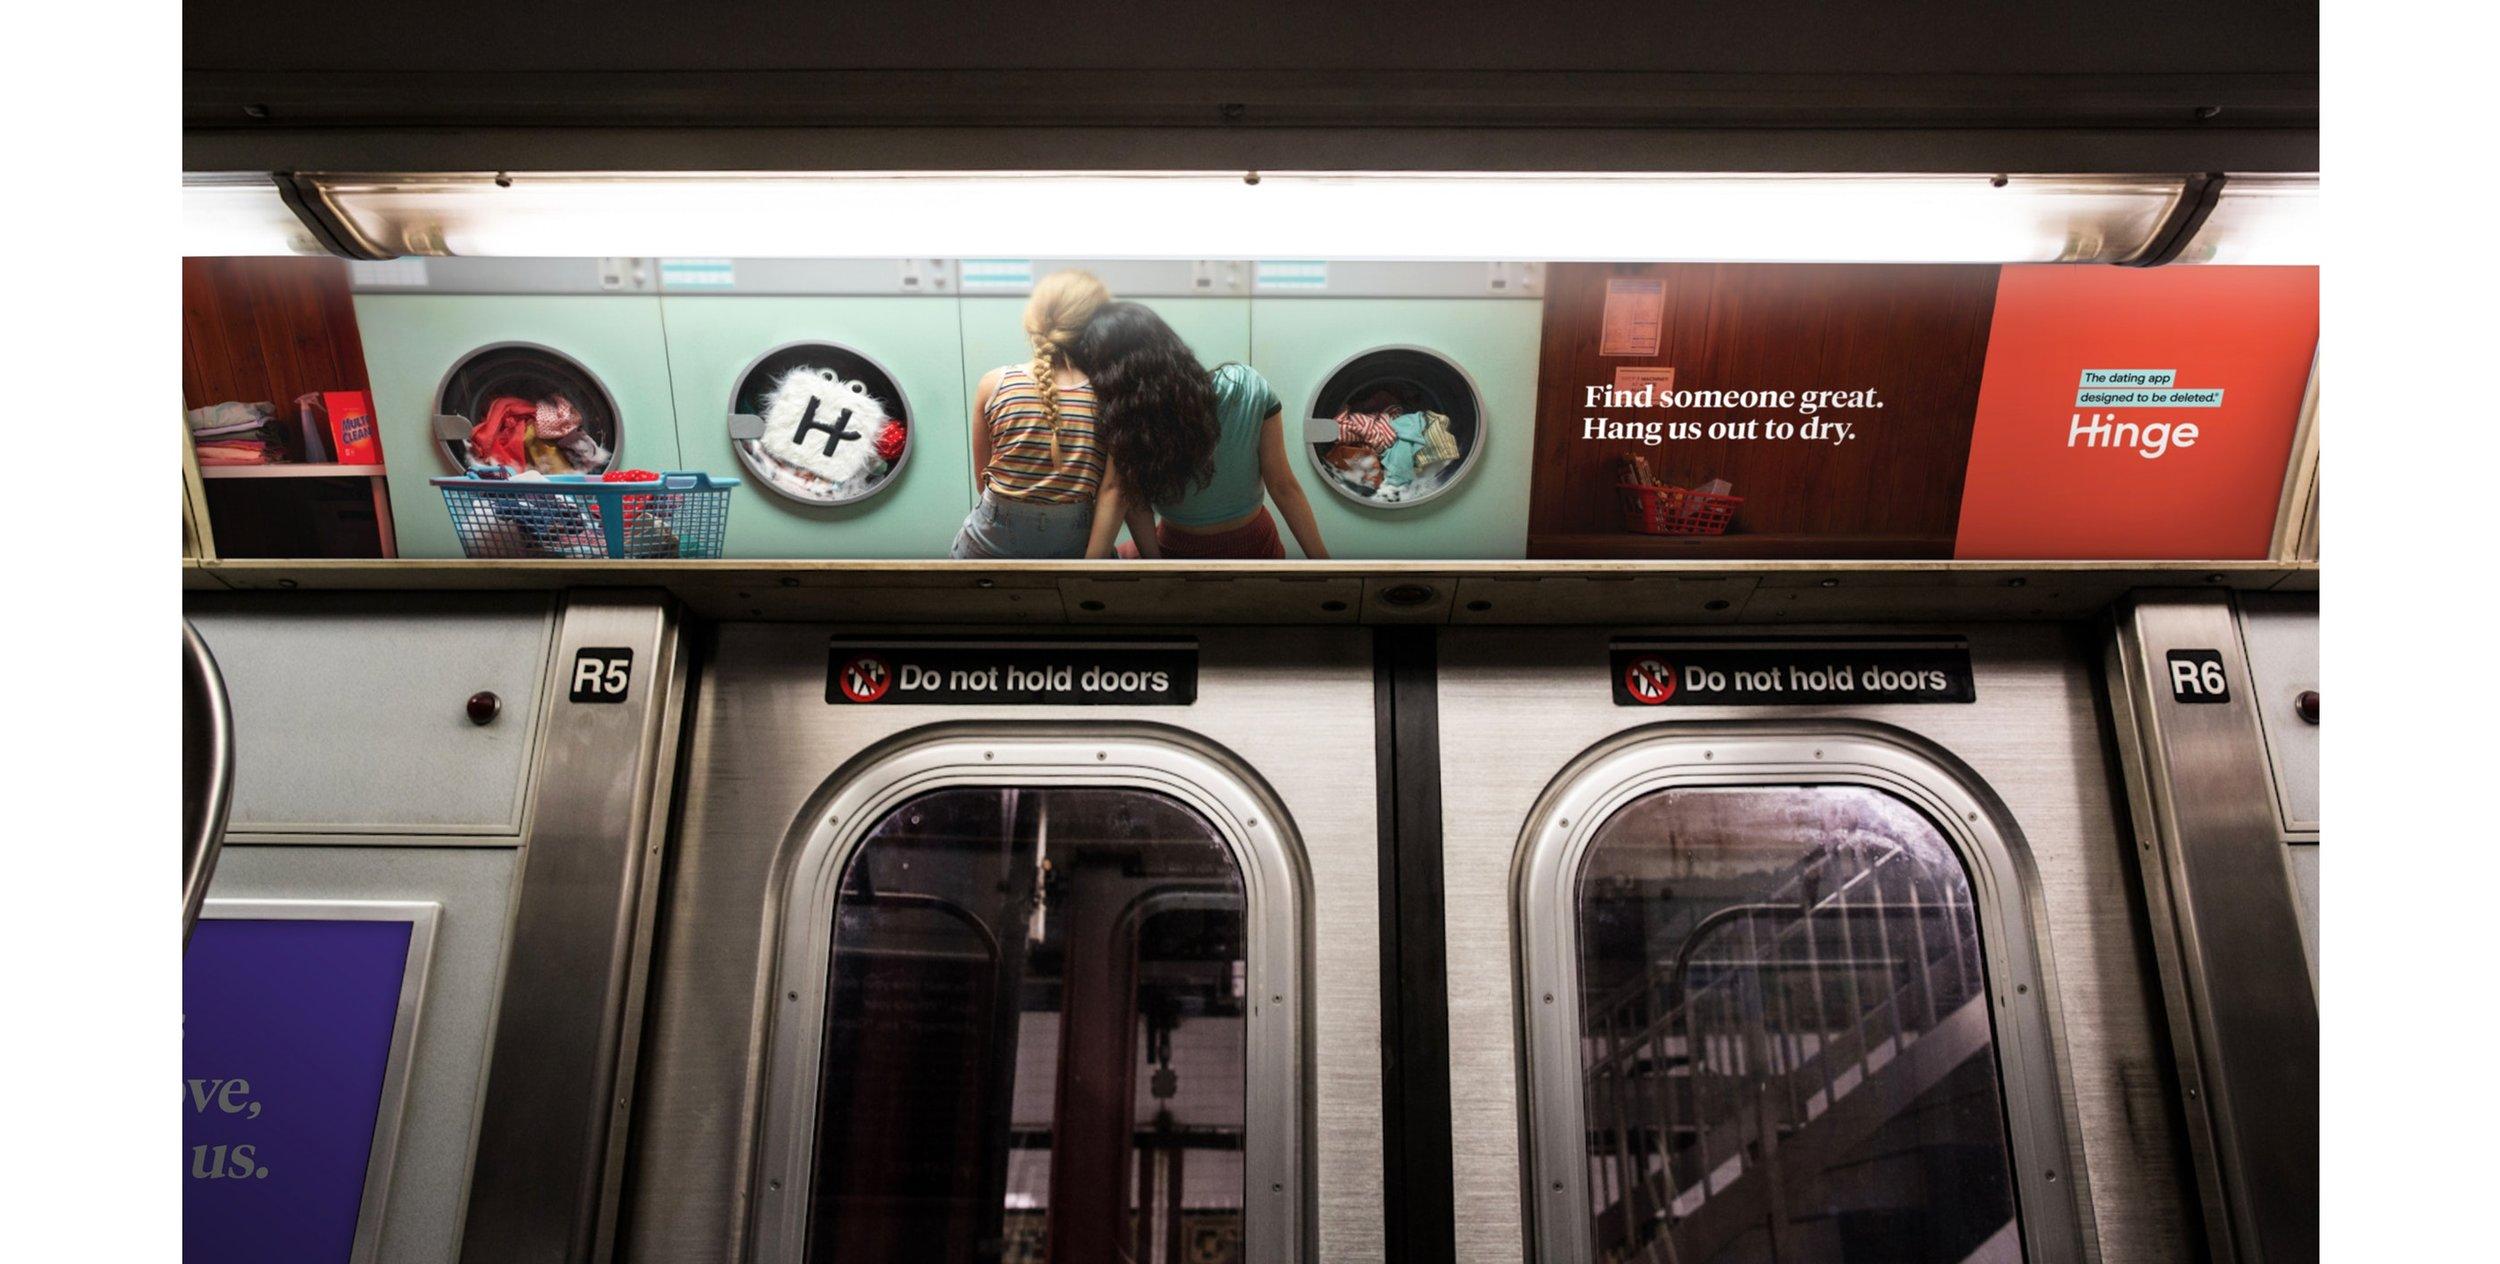 Hinge-Campaign-OOH-Subway-Laundry.jpg